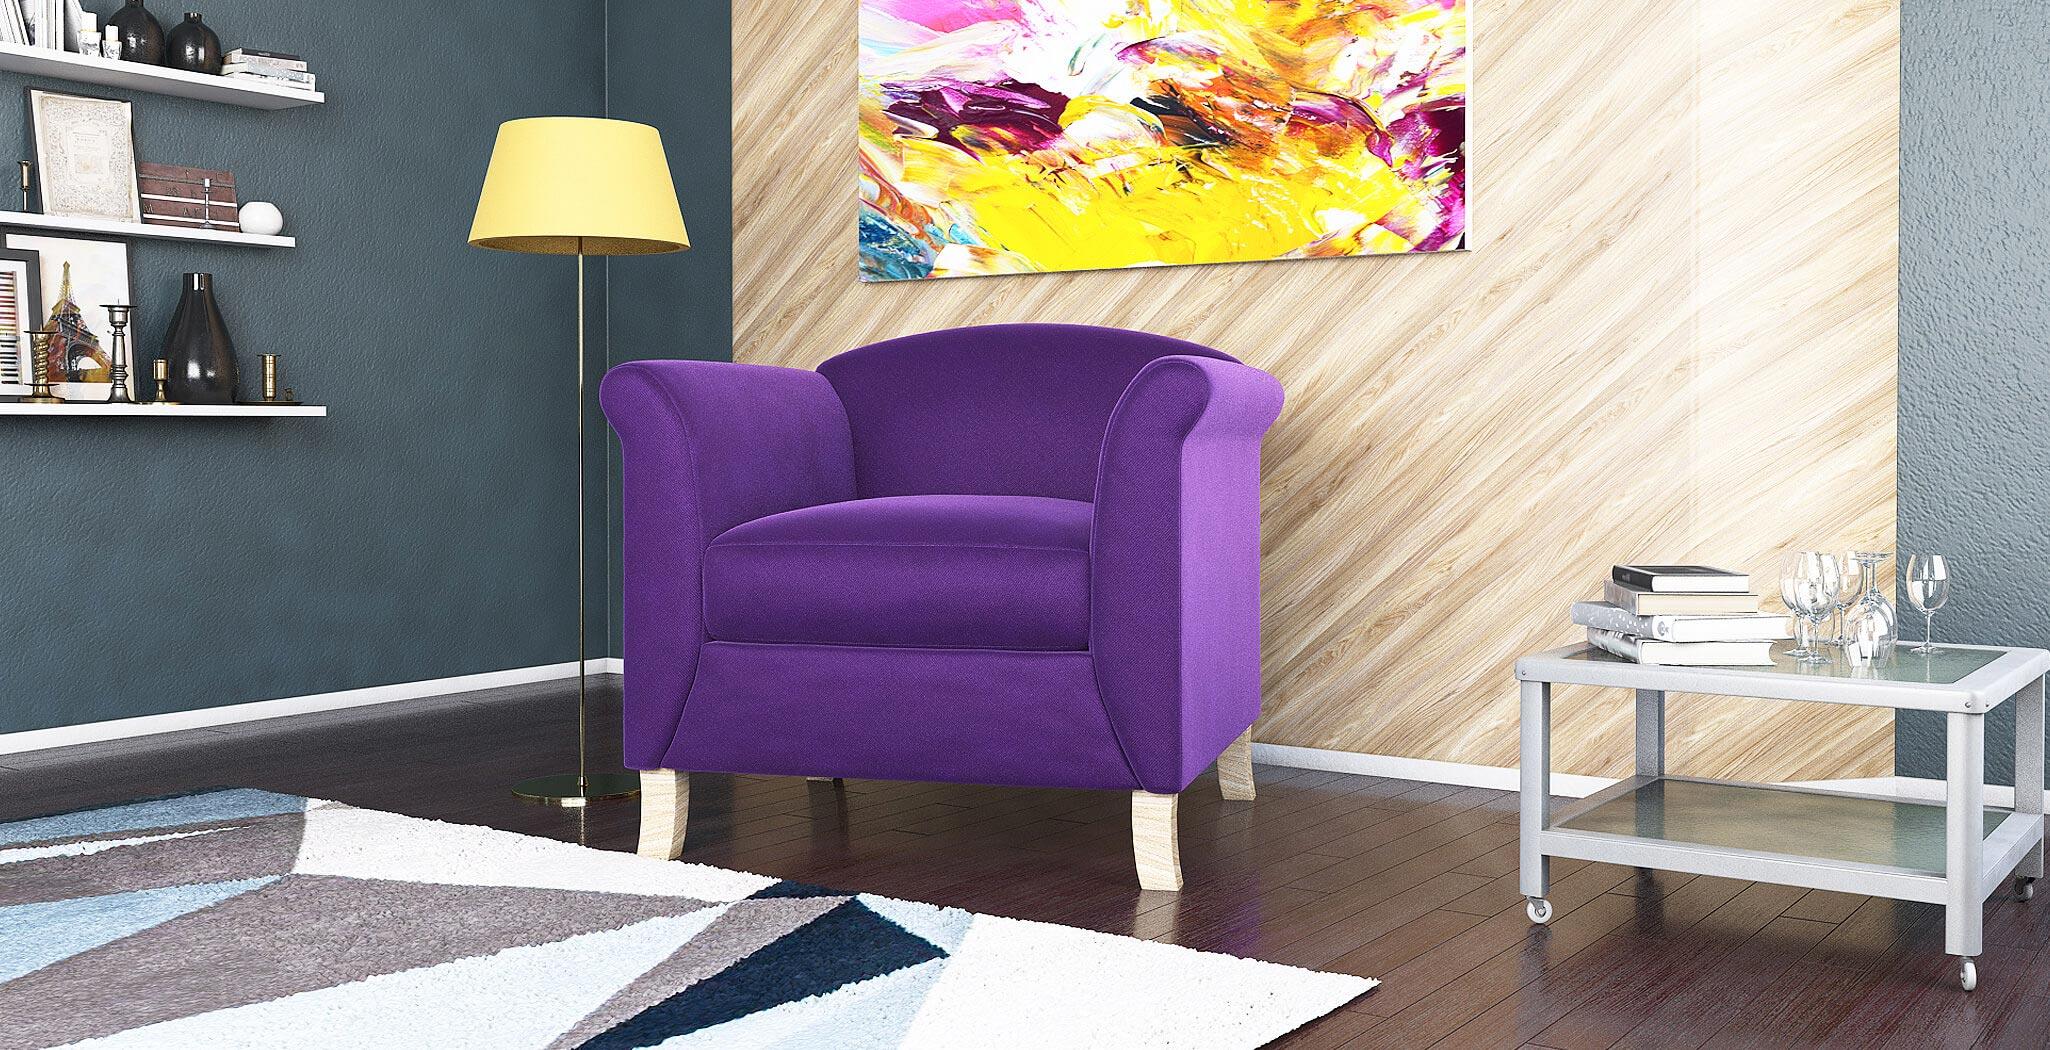 crete chair furniture gallery 4